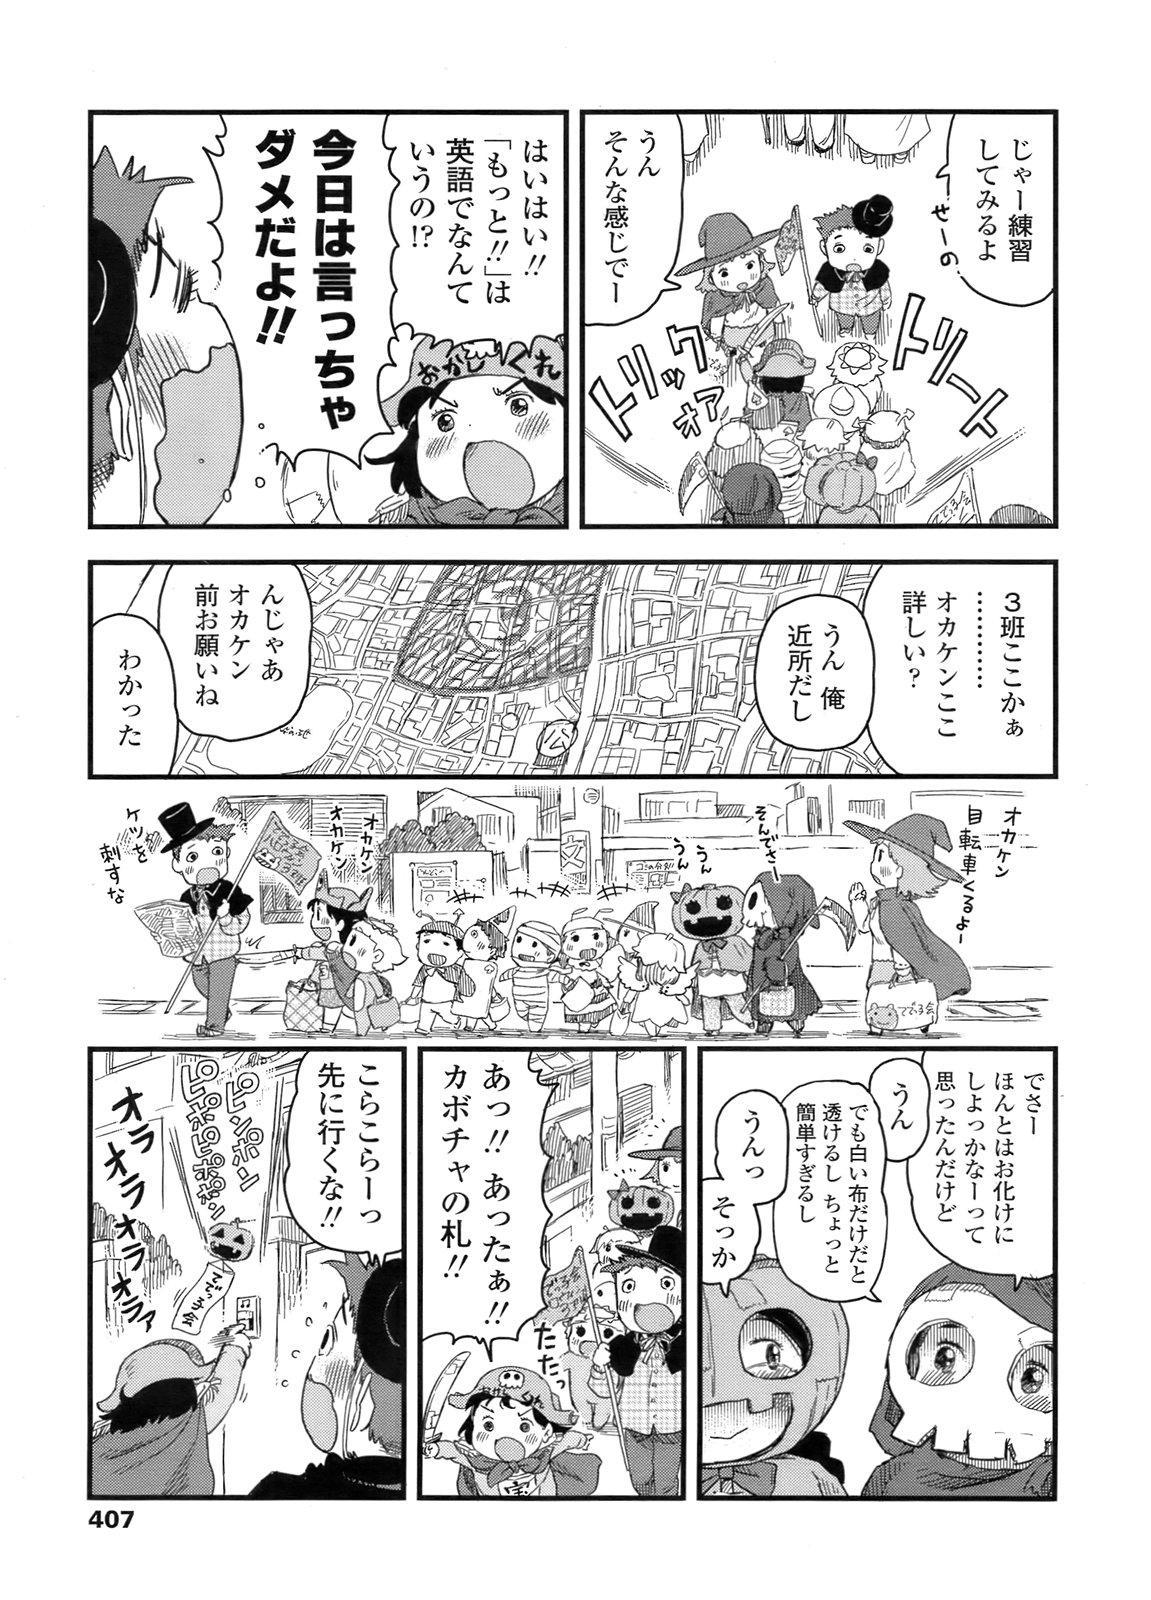 COMIC LO 2011-12 Vol. 93 407